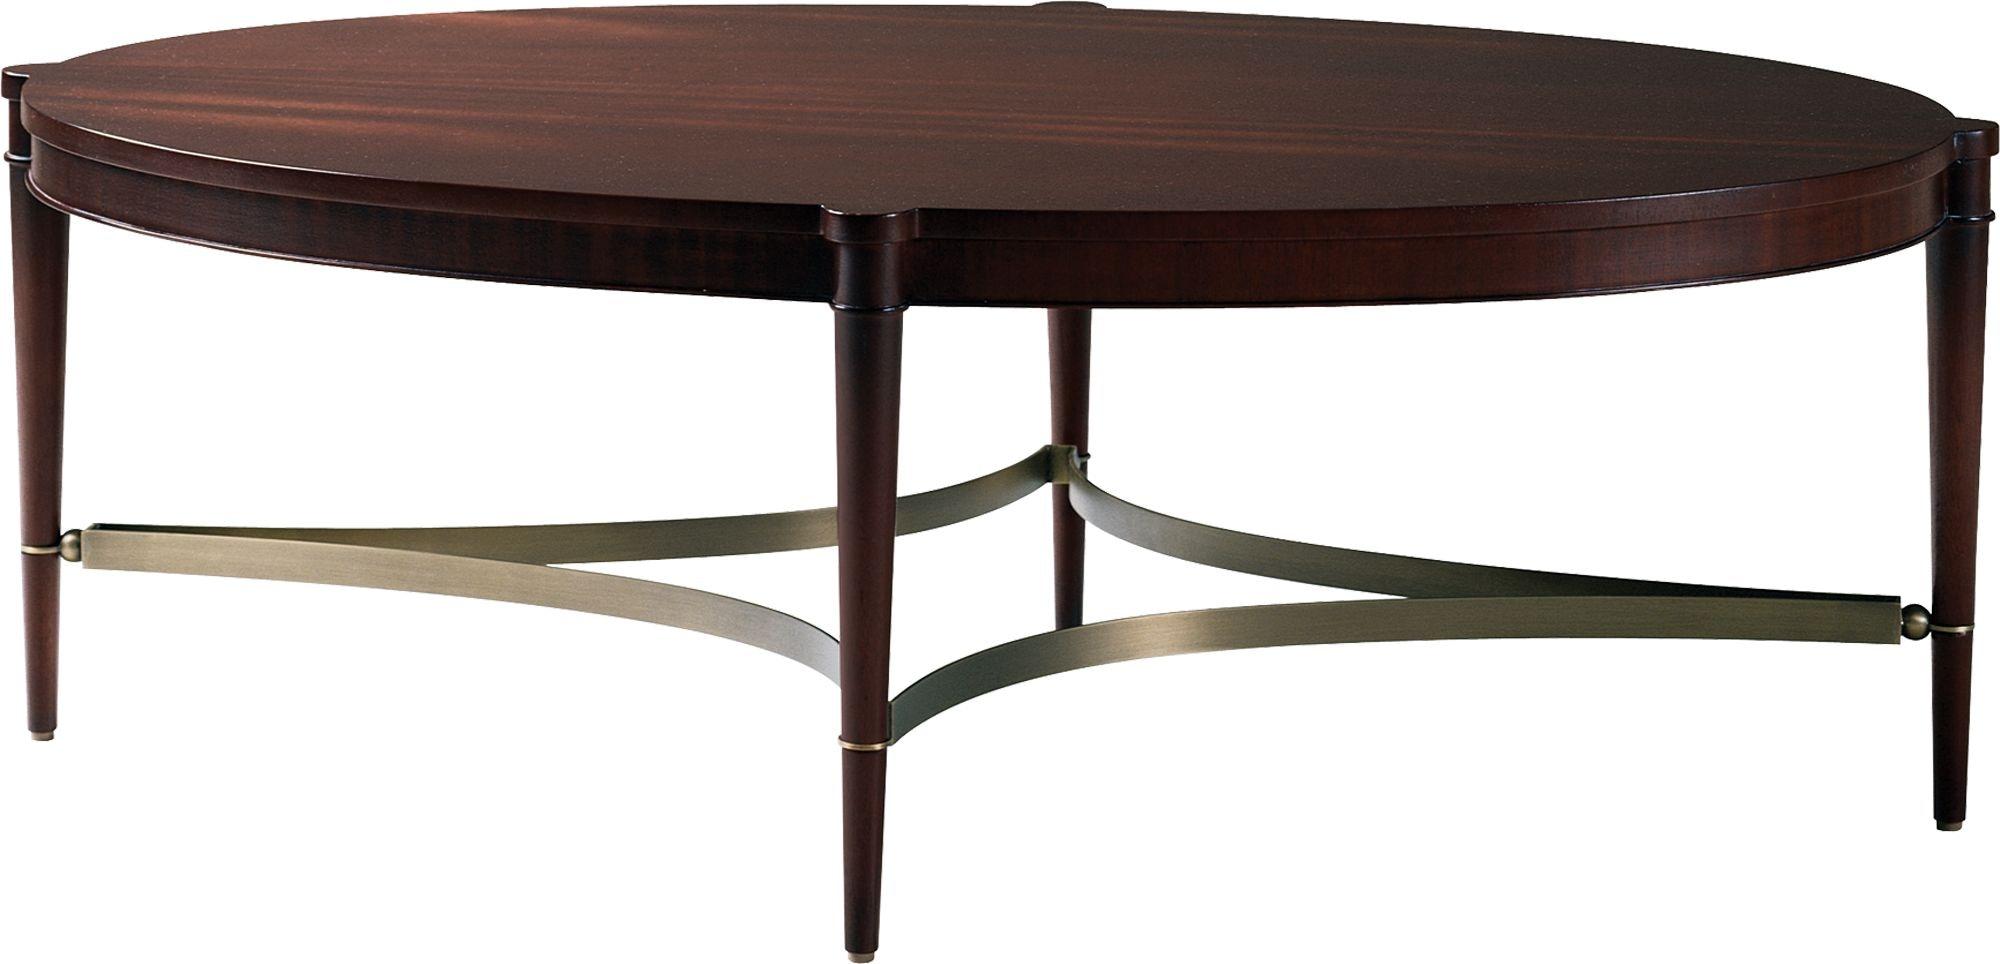 Baker Furniture 7855 Living Room Thomas Pheasant Oval Coffee Table